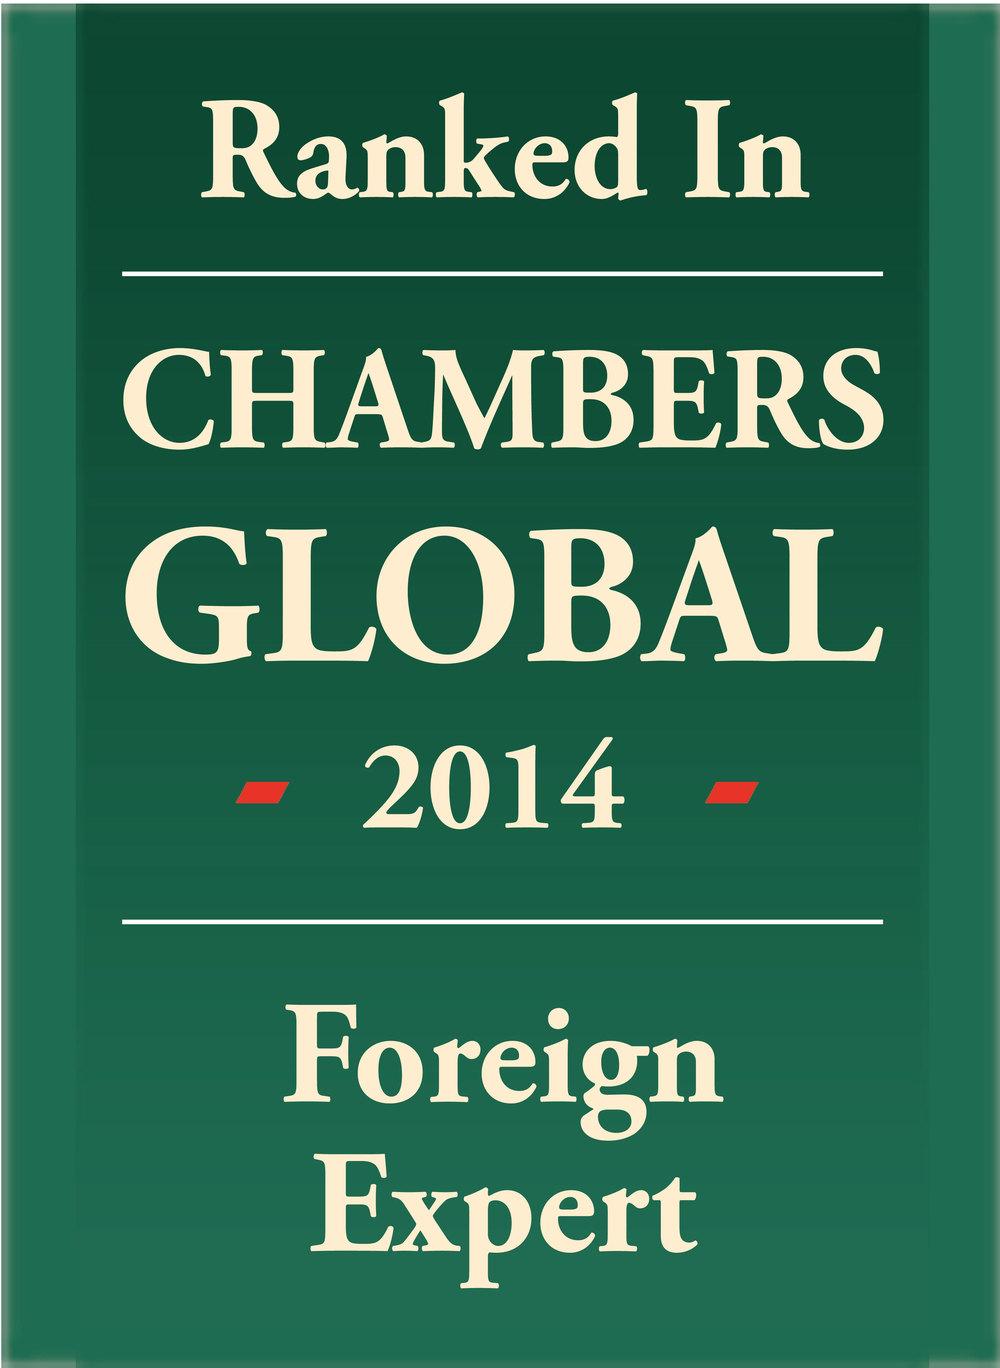 Chambers-Global-2014-Foreign-Expert.jpg